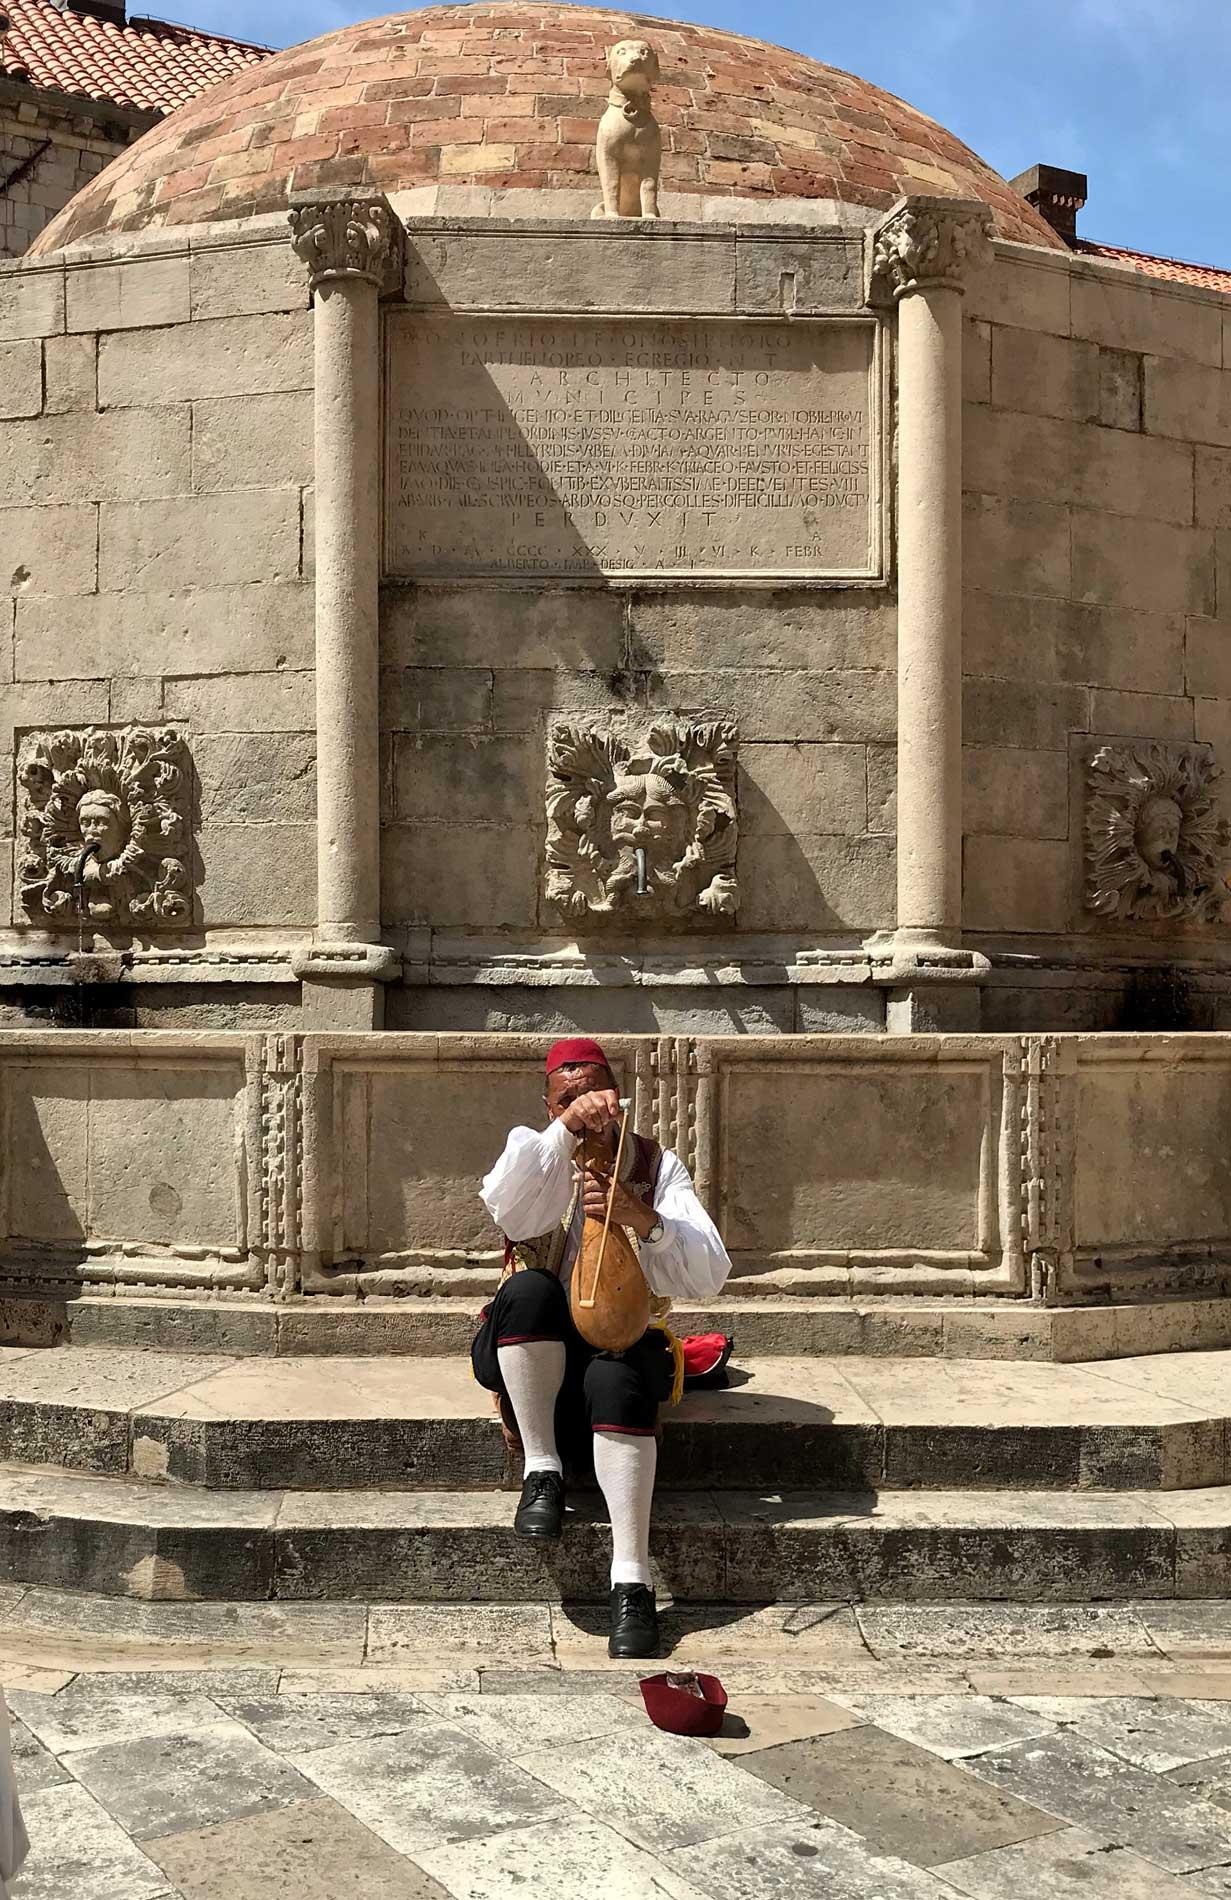 Dubrovnik-Fontana-Grande-di-Onofrio-uomo-vestiti-tipici